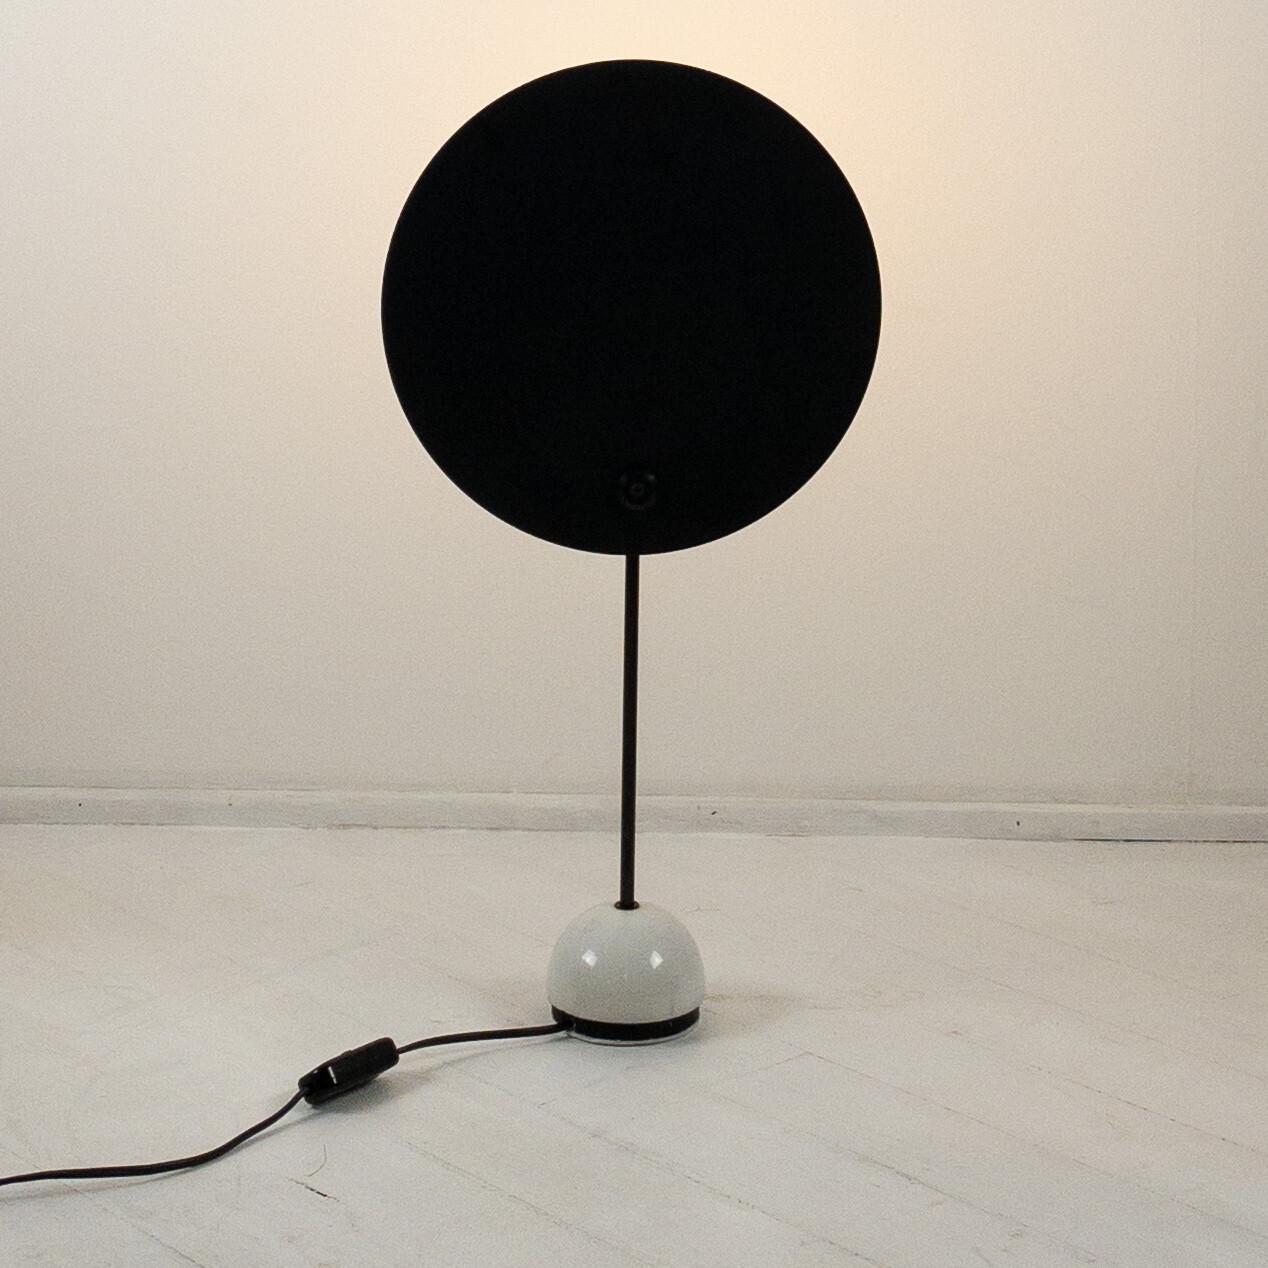 Kuta table lamp by Vico Magistretti 1980